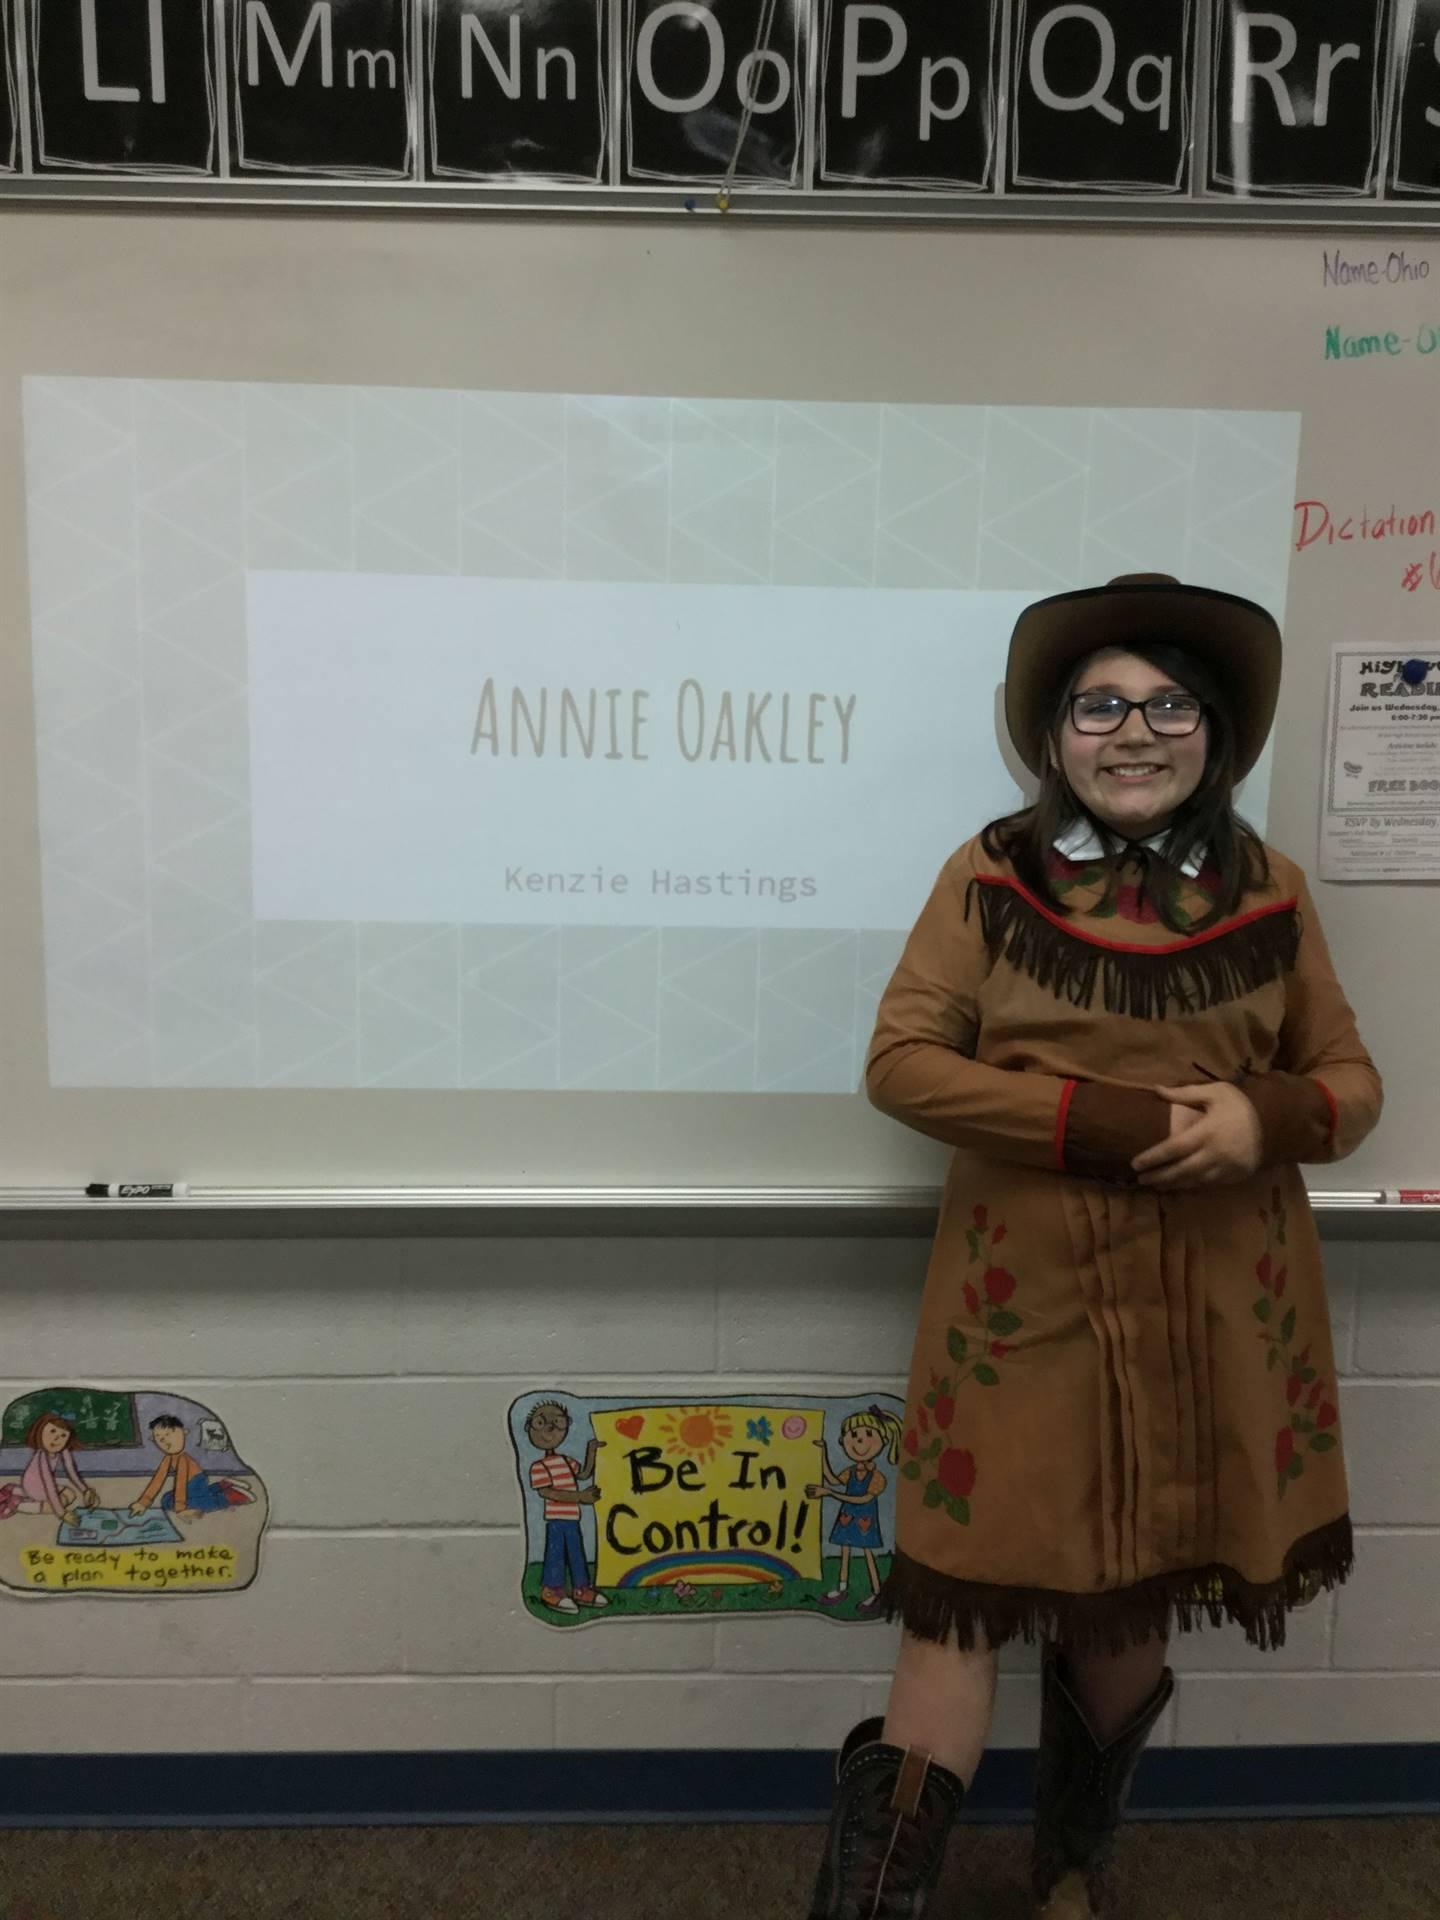 Kenzie is Annie Oakley